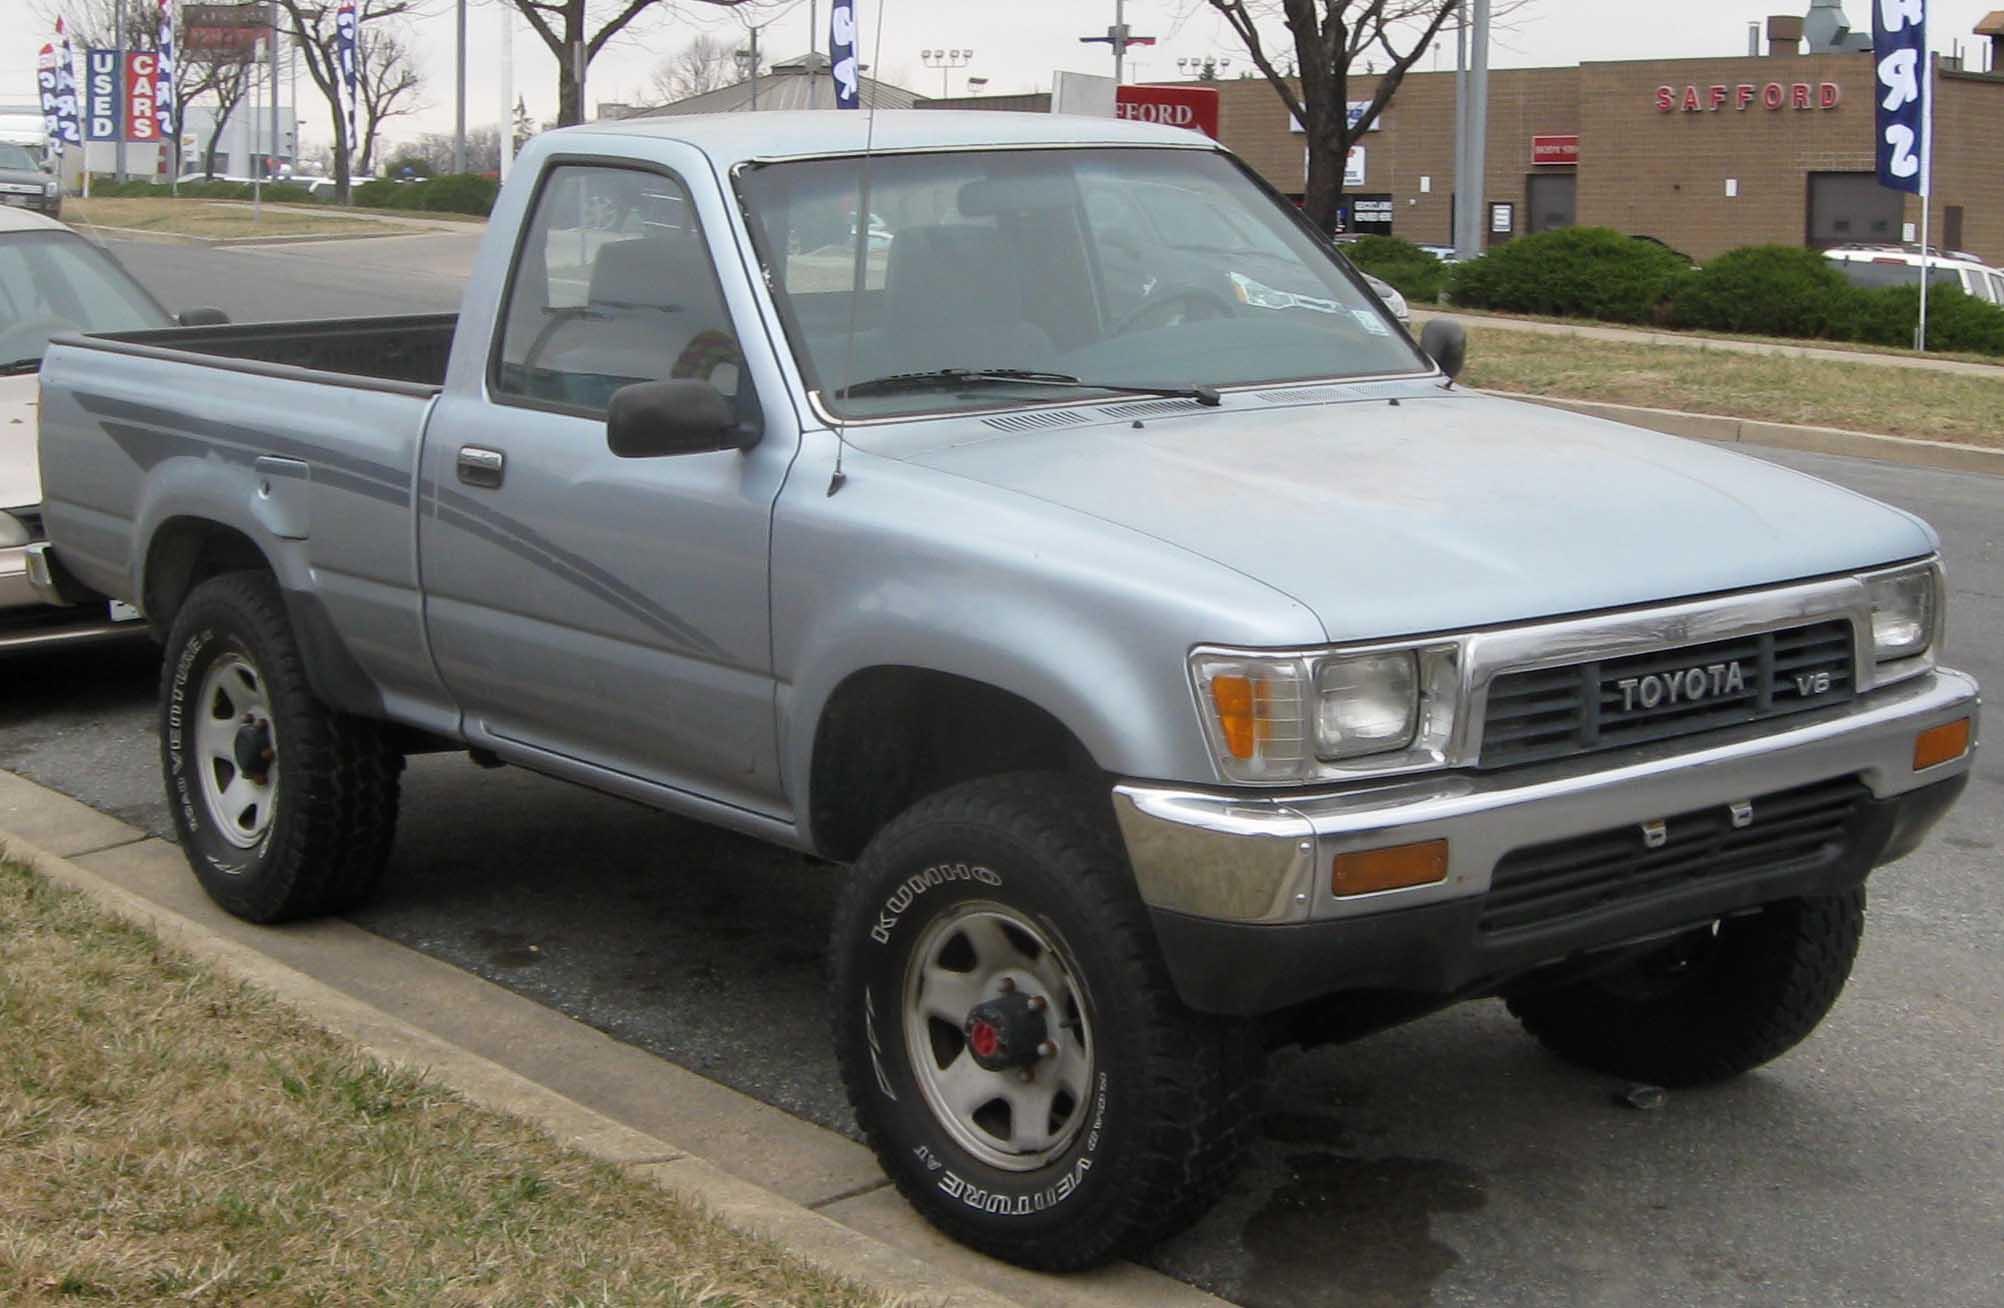 File:1st Toyota Tacoma.jpg - Wikimedia Commons